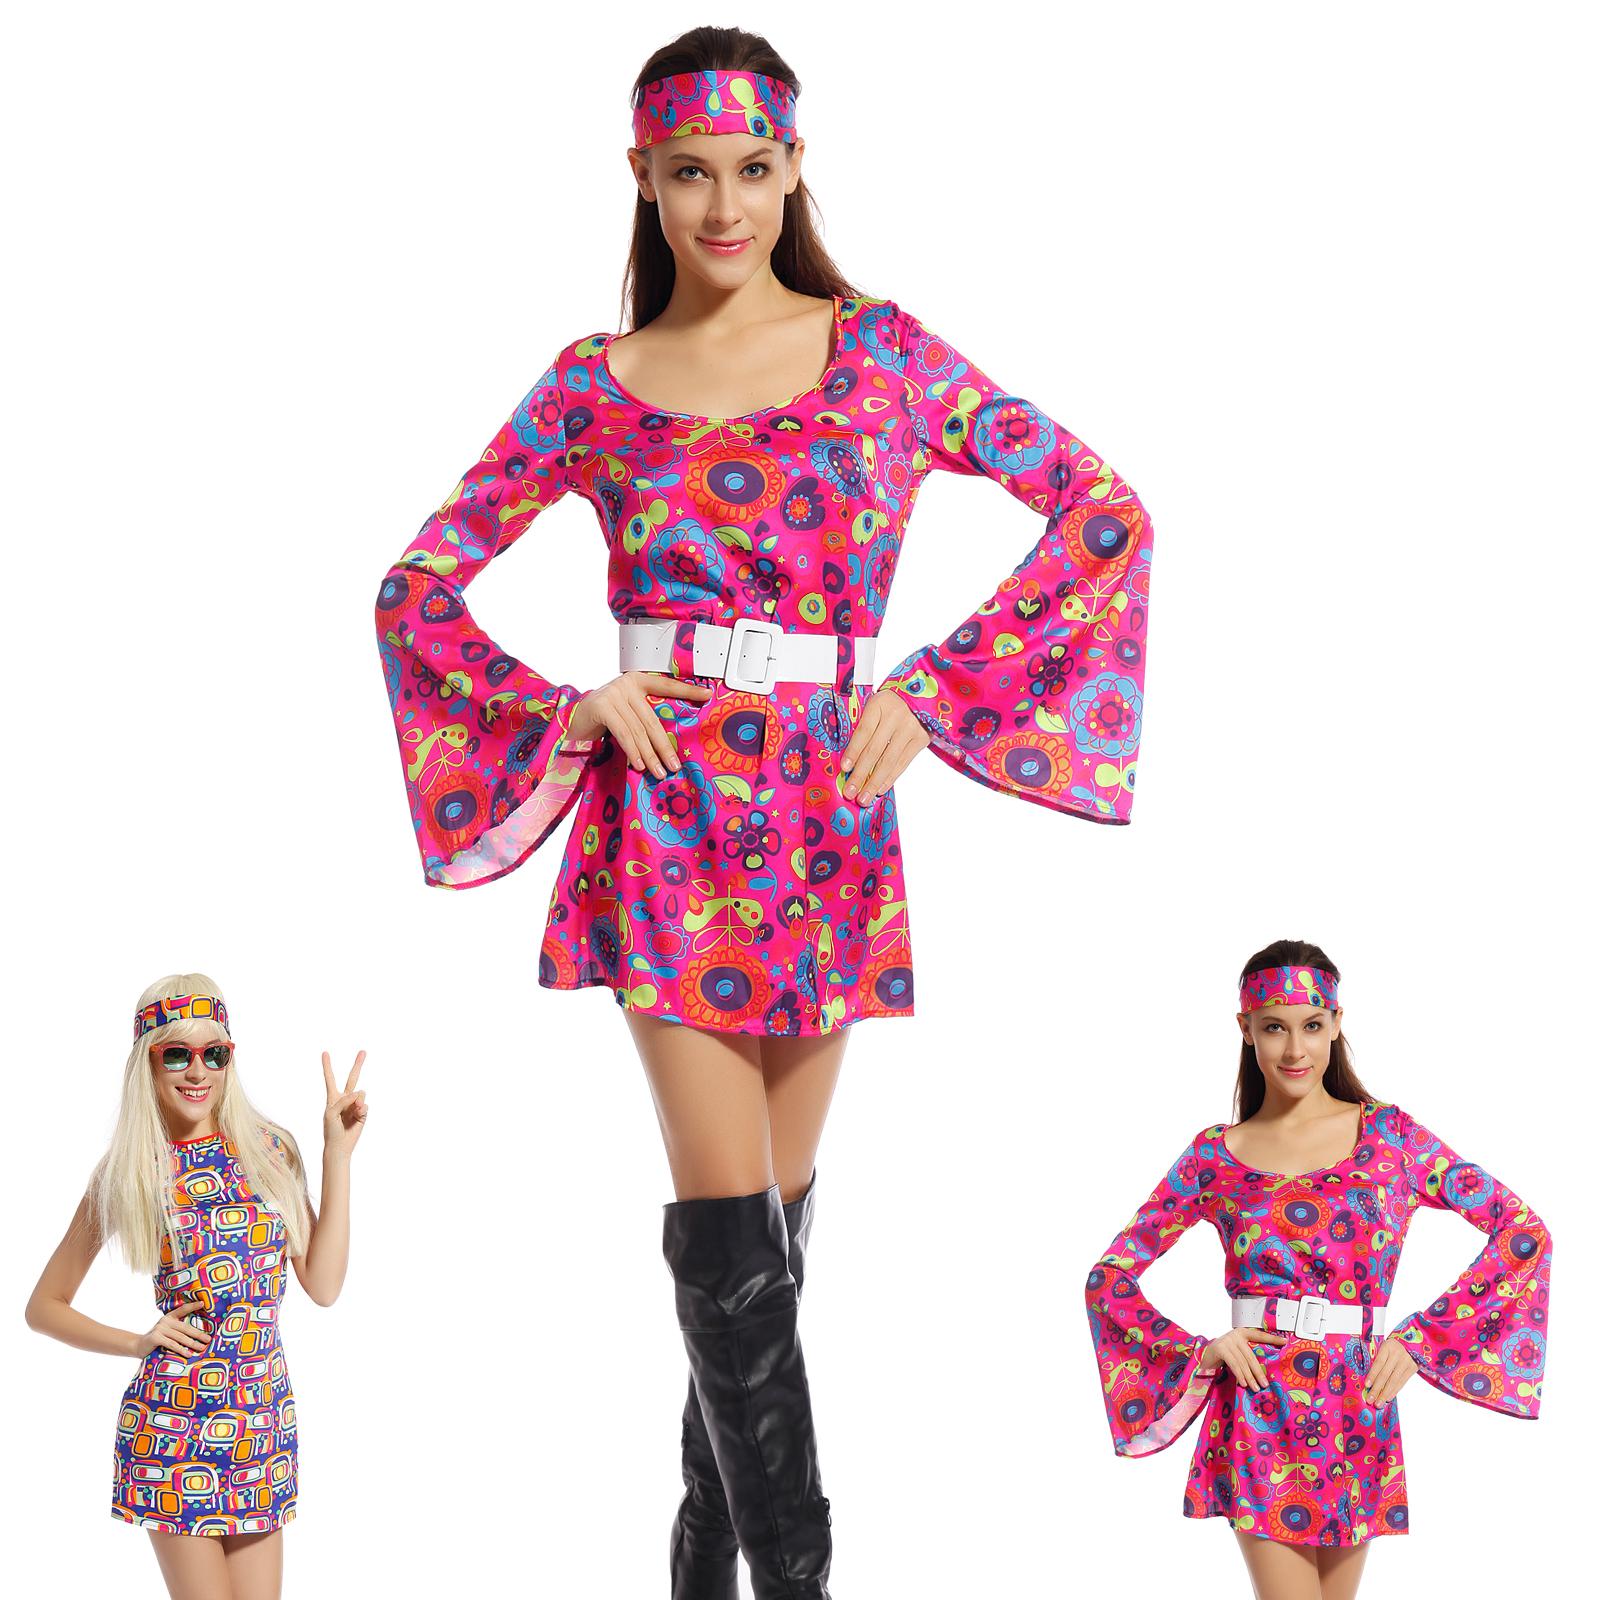 Disfraz de Hippie flowerpower Años 60 Vintage para Mujer Fiesta ...